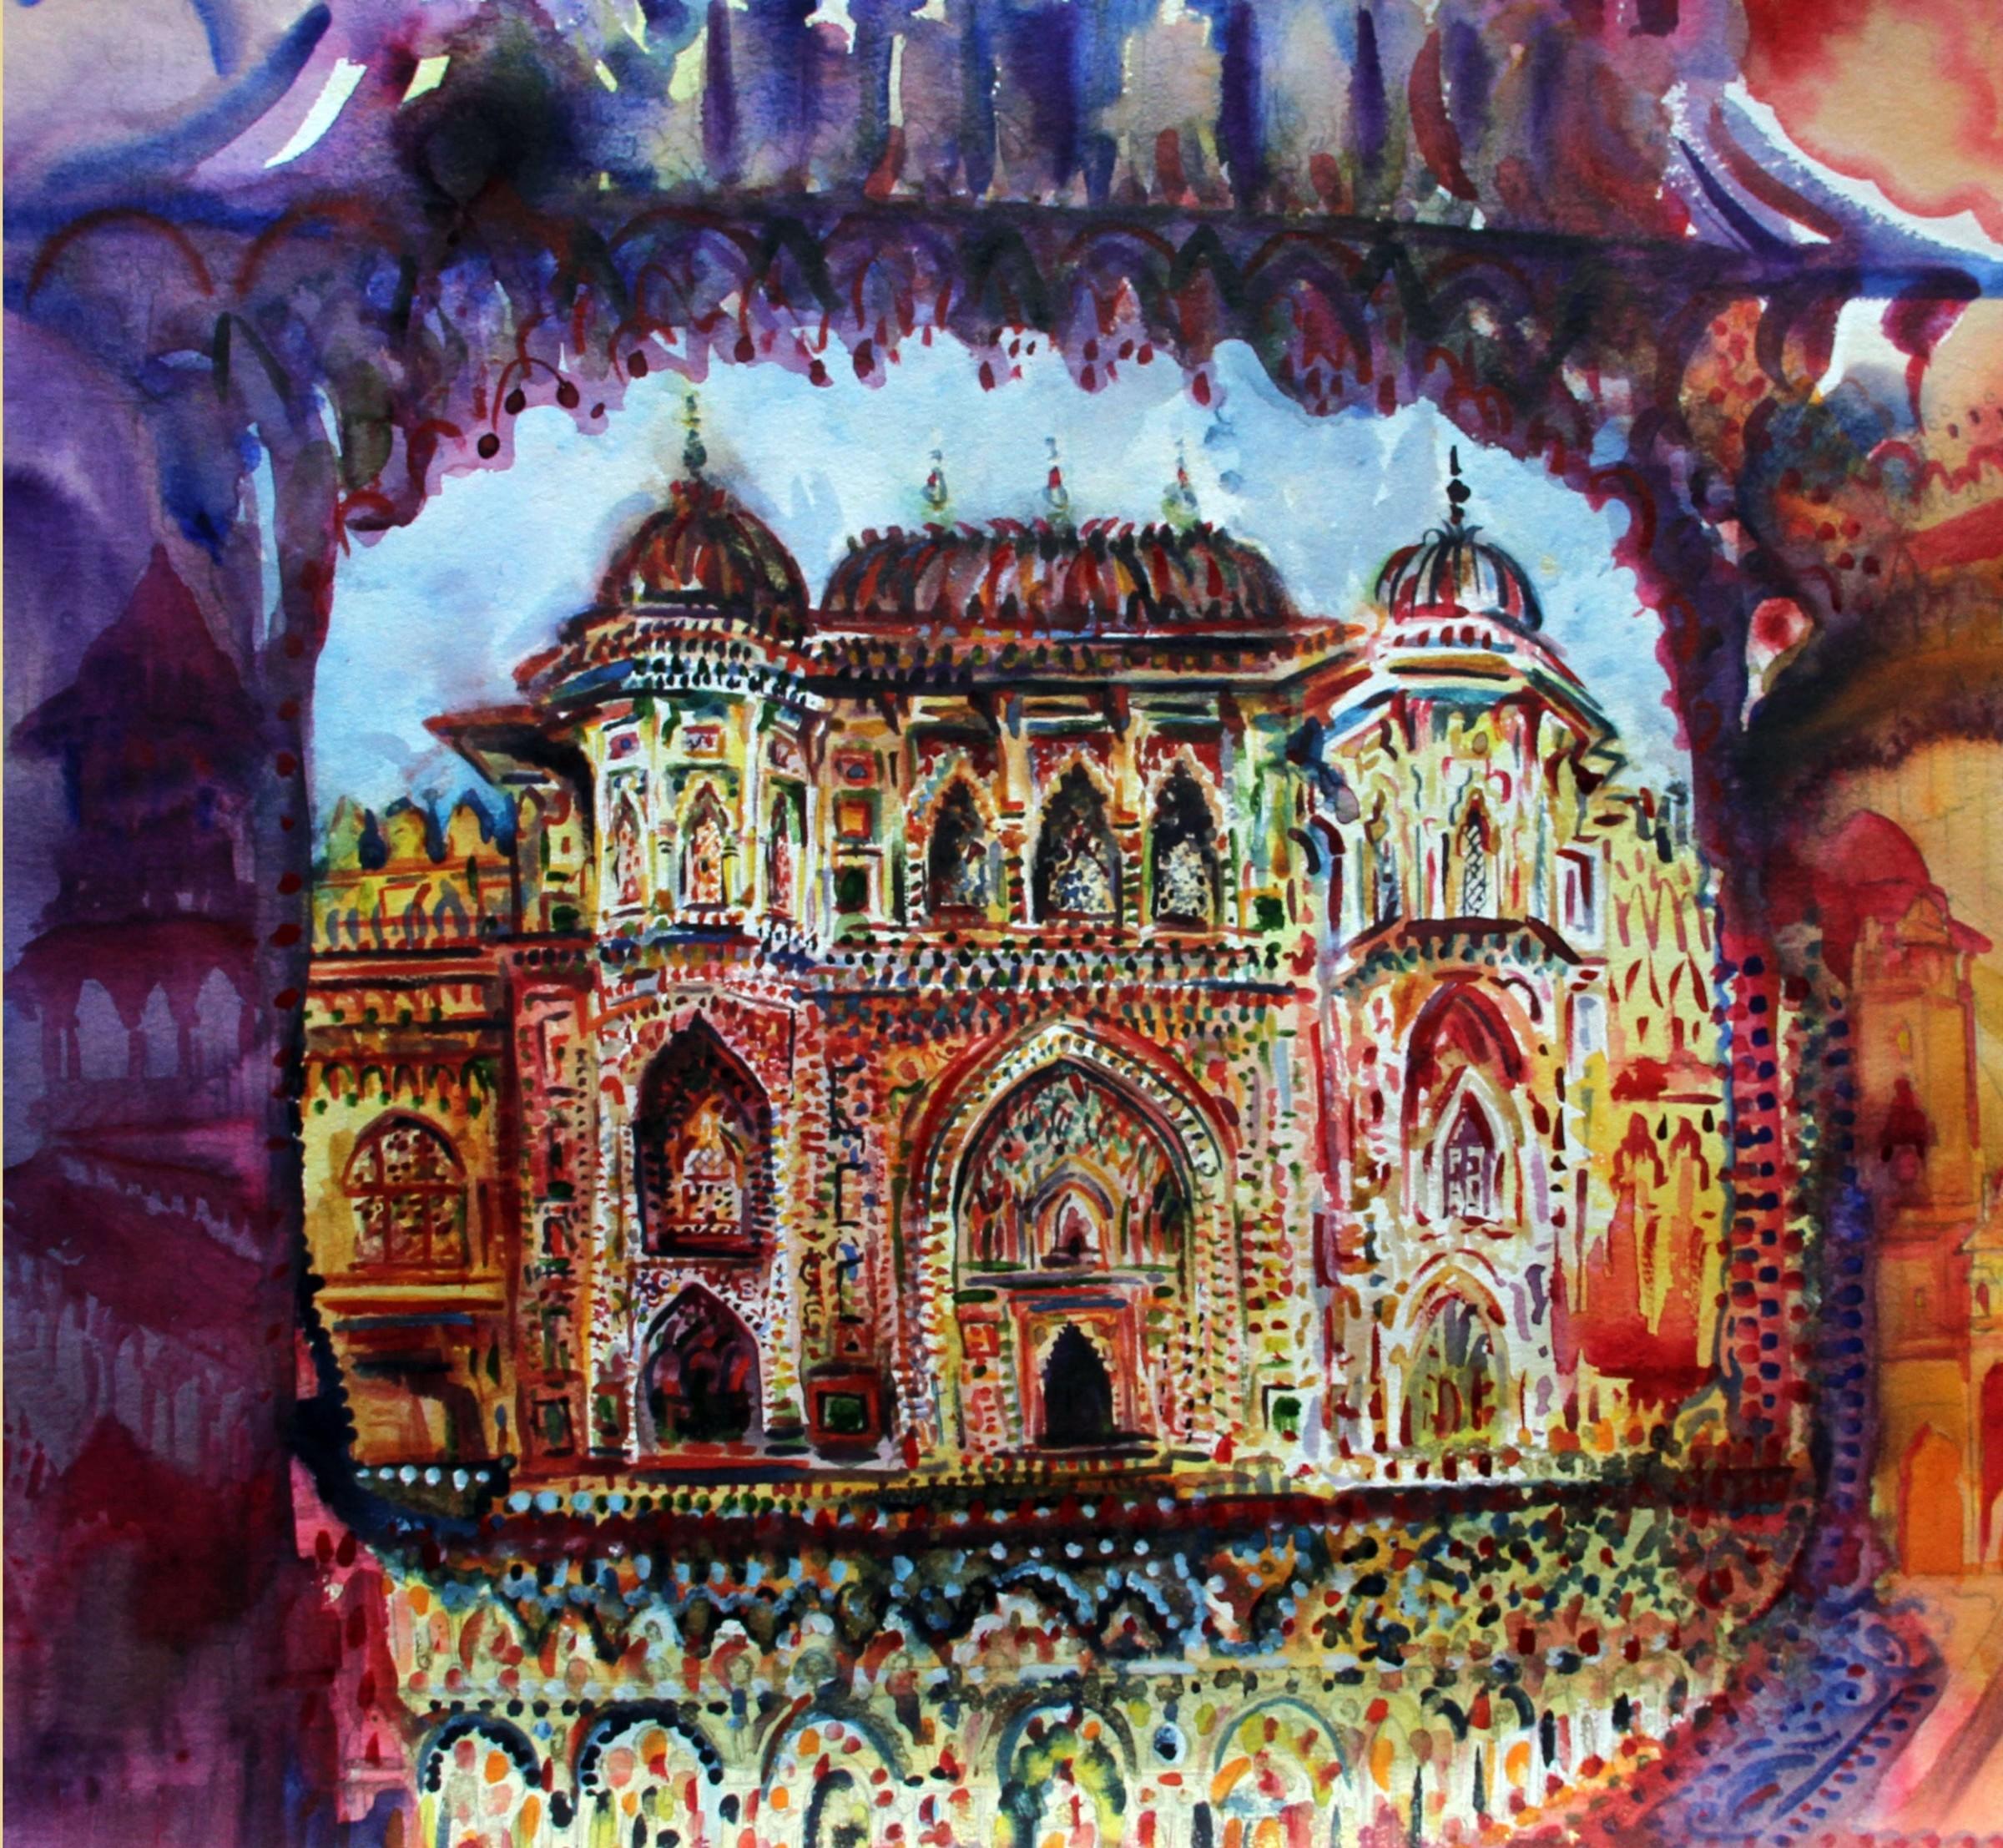 "<span class=""link fancybox-details-link""><a href=""/exhibitions/37/works/artworks_standalone12139/"">View Detail Page</a></span><div class=""medium"">watercolour</div><div class=""dimensions"">Frame: 75 x 74 cm<br /> Artwork: 57 x 55 cm</div>"